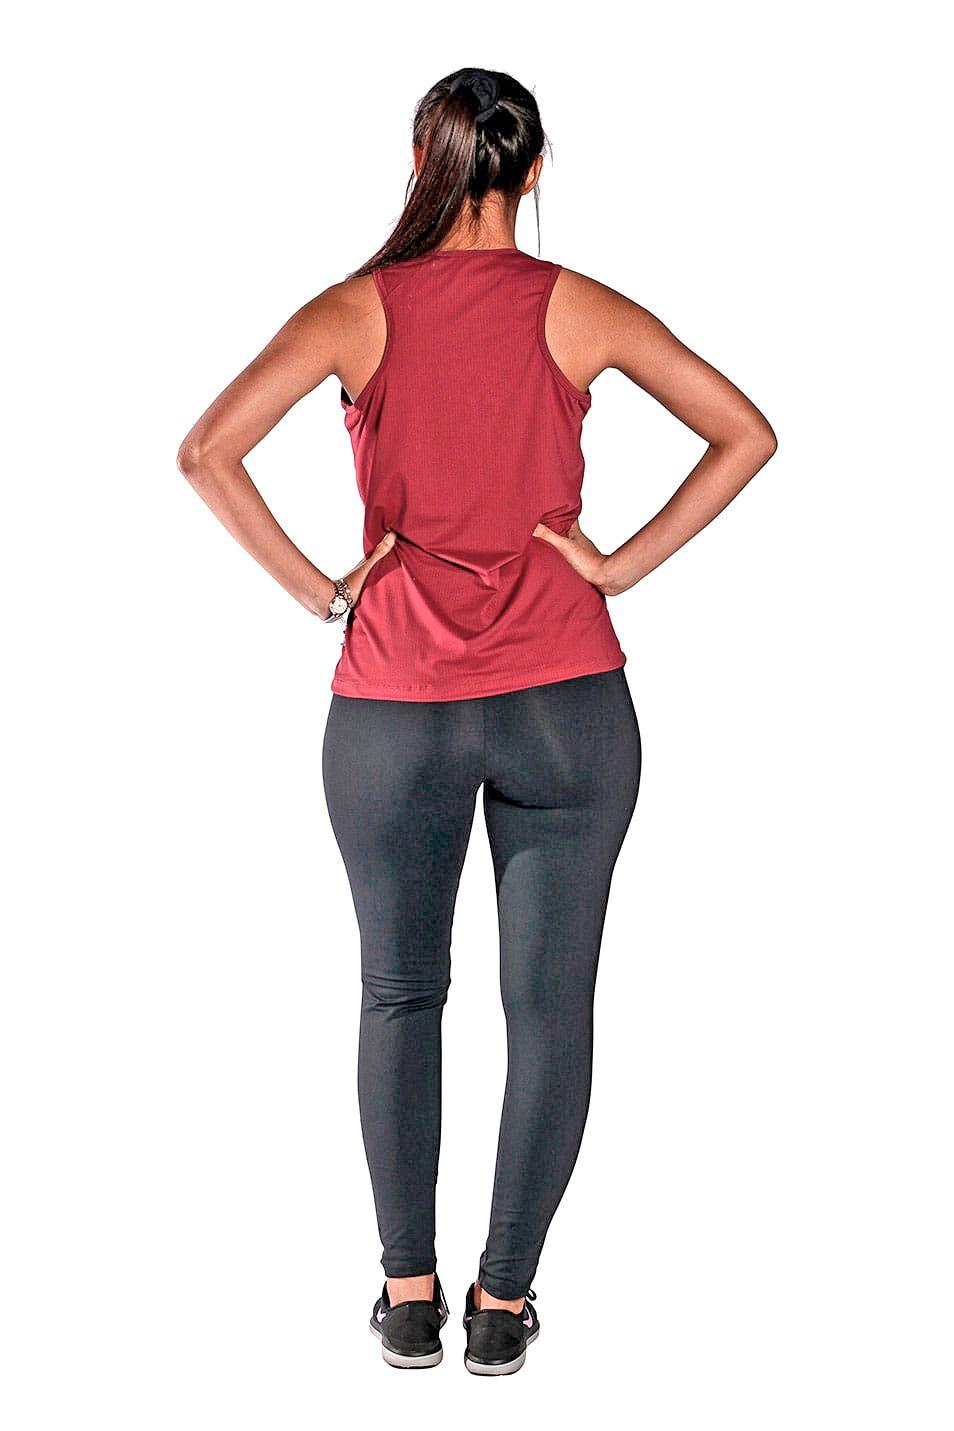 Camiseta Feminina Regata UV 50+ New Trip Marsala